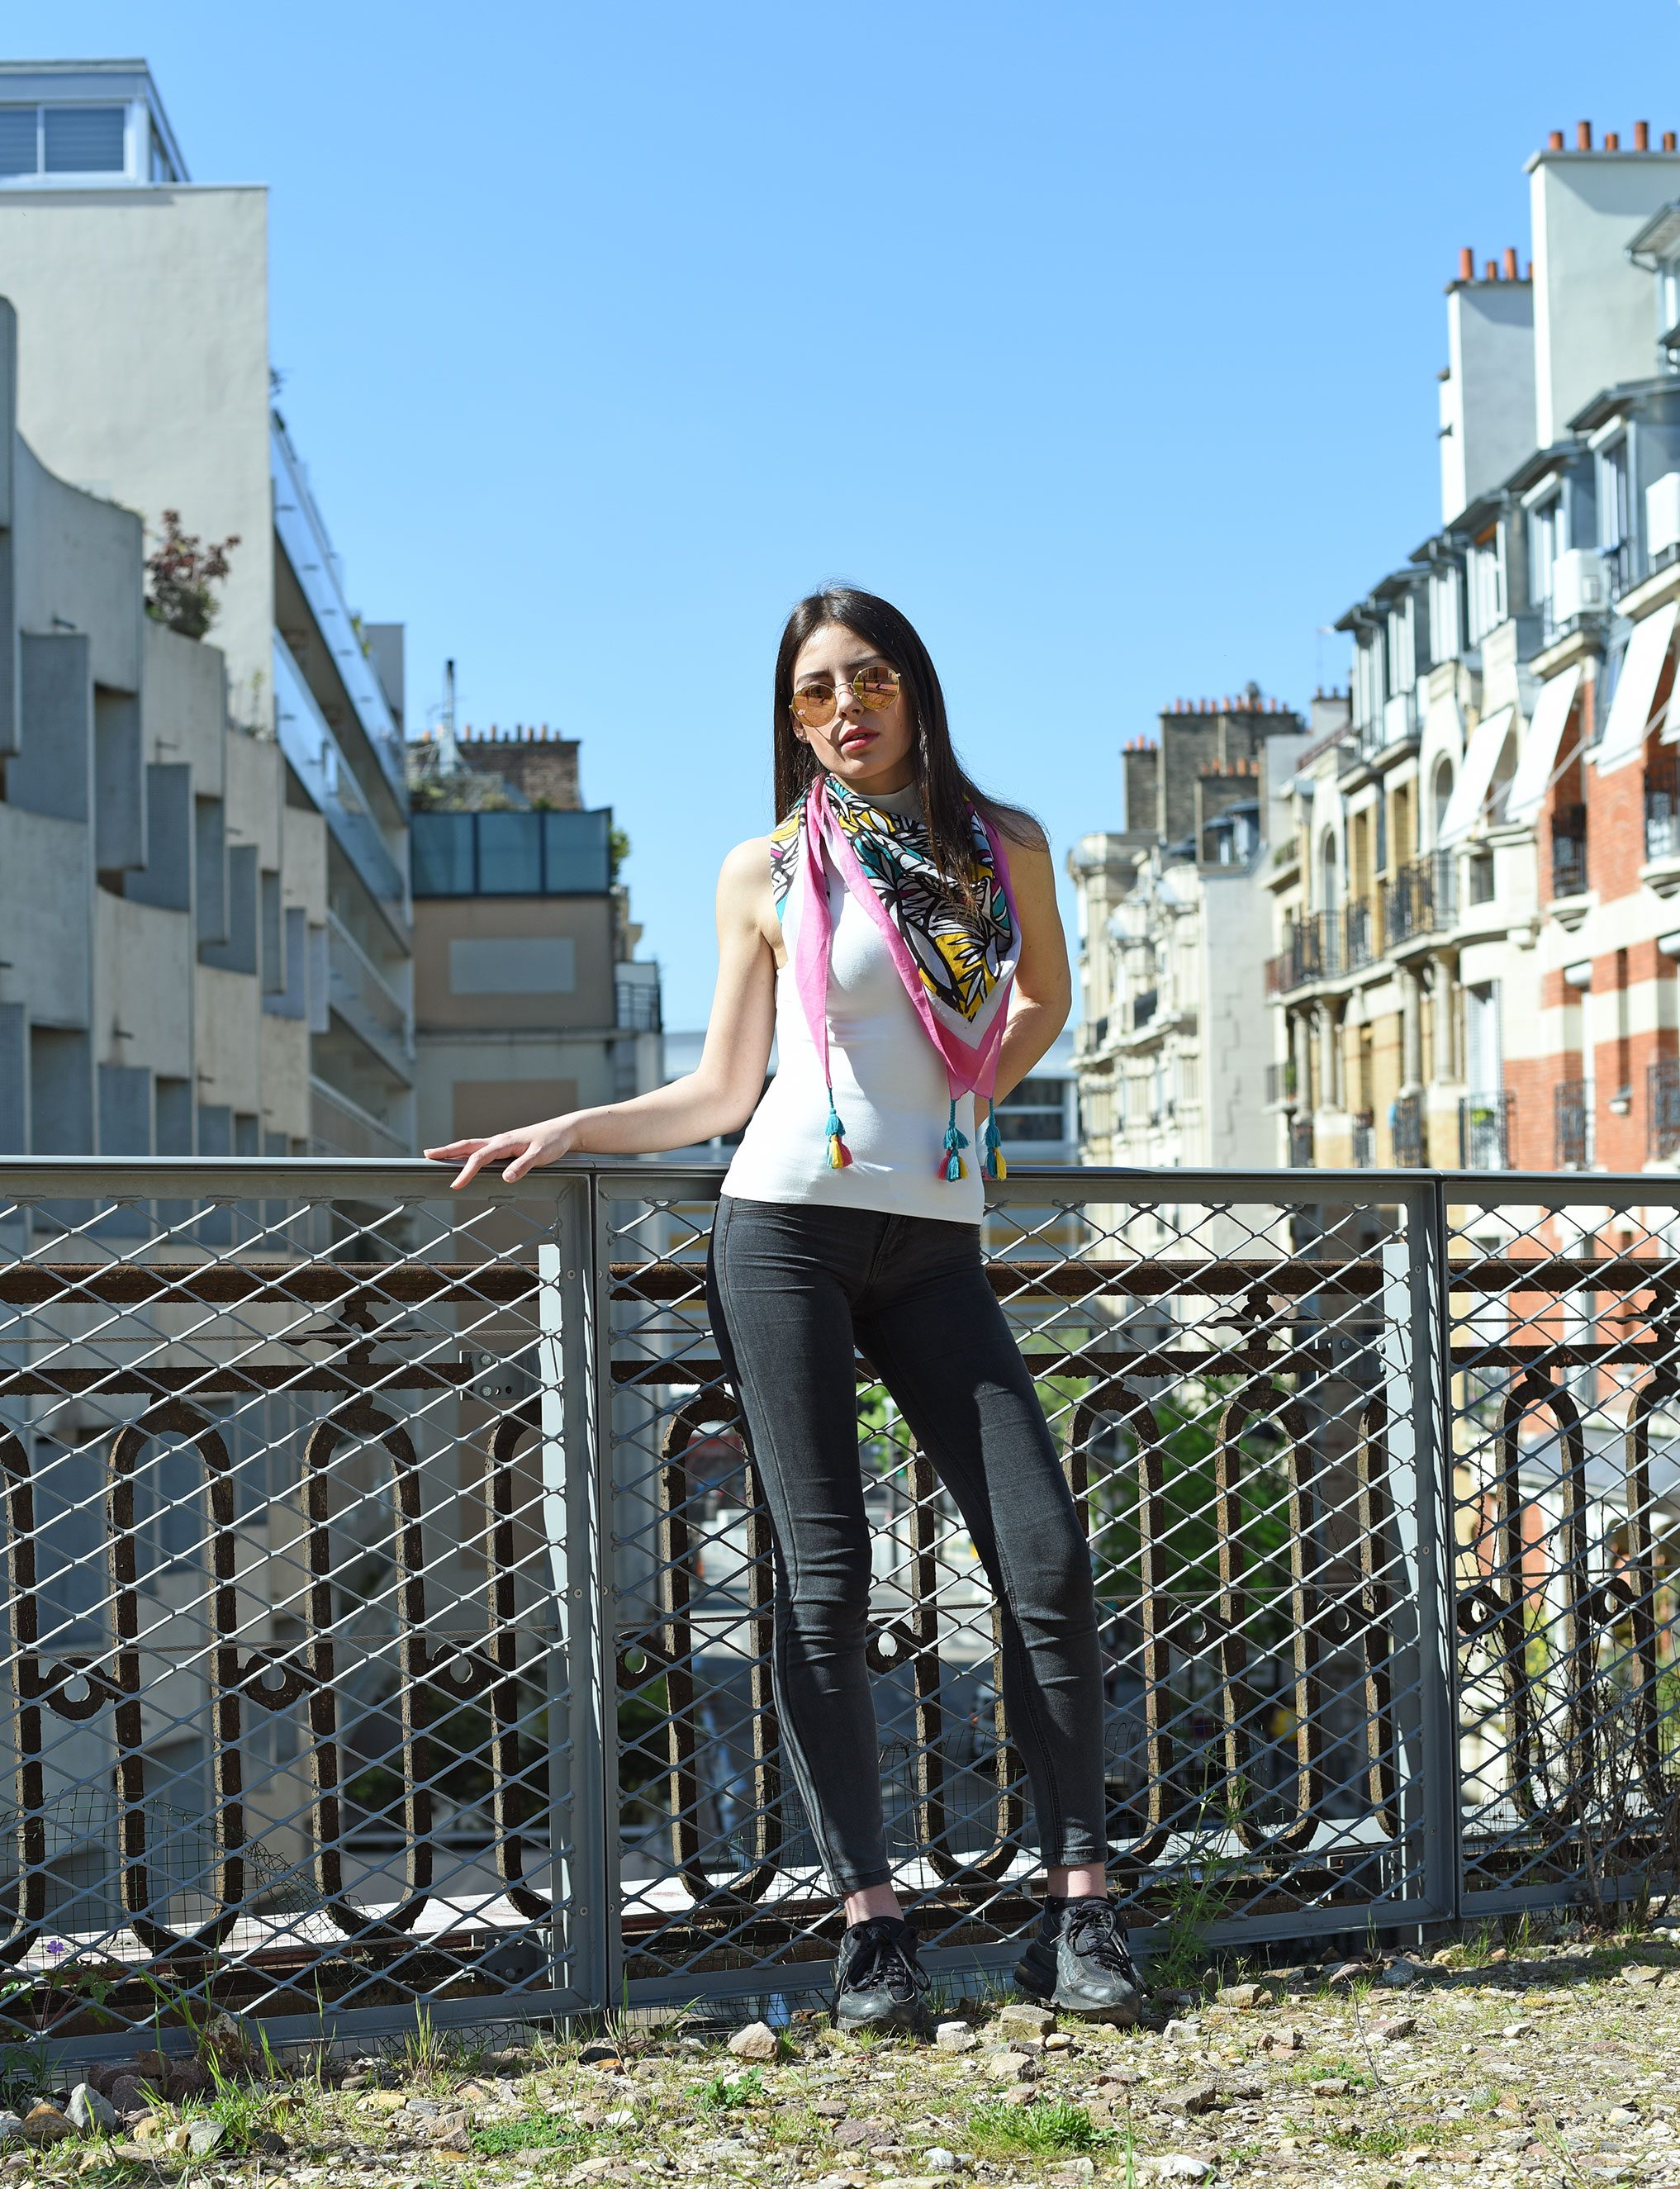 http://lookbook.allee-du-foulard.fr/wp-content/uploads/2018/05/0662-ADF-Accessoires-de-mode-LB-Coll-ethnique-valoa-rose-3-1-2034x2650.jpg